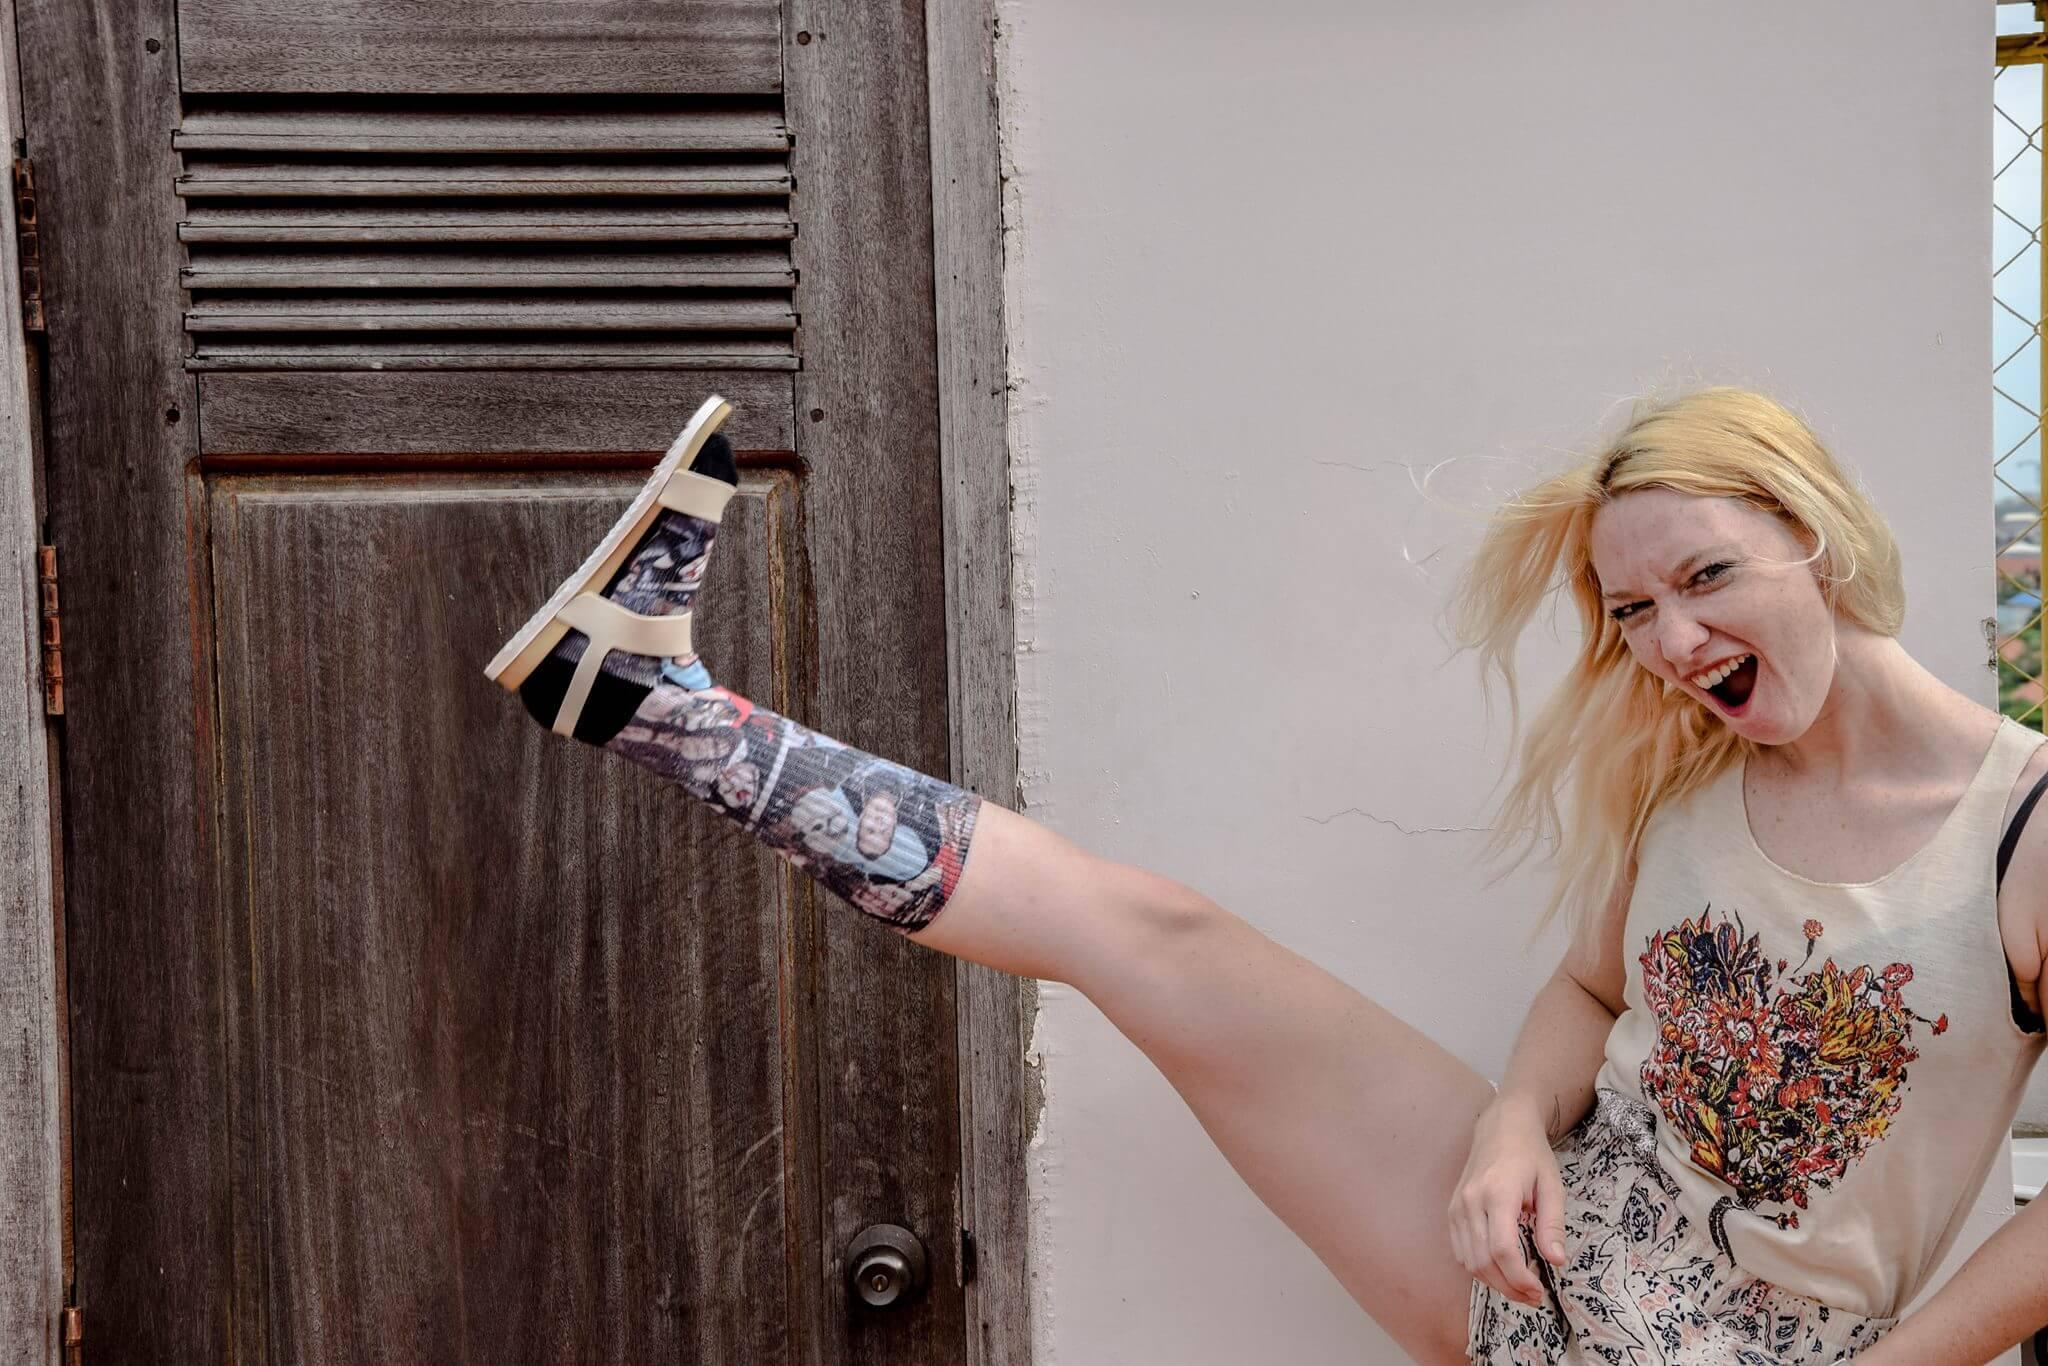 claquette-chaussette- claquette chaussette- blogueuse-mode-lifestyle